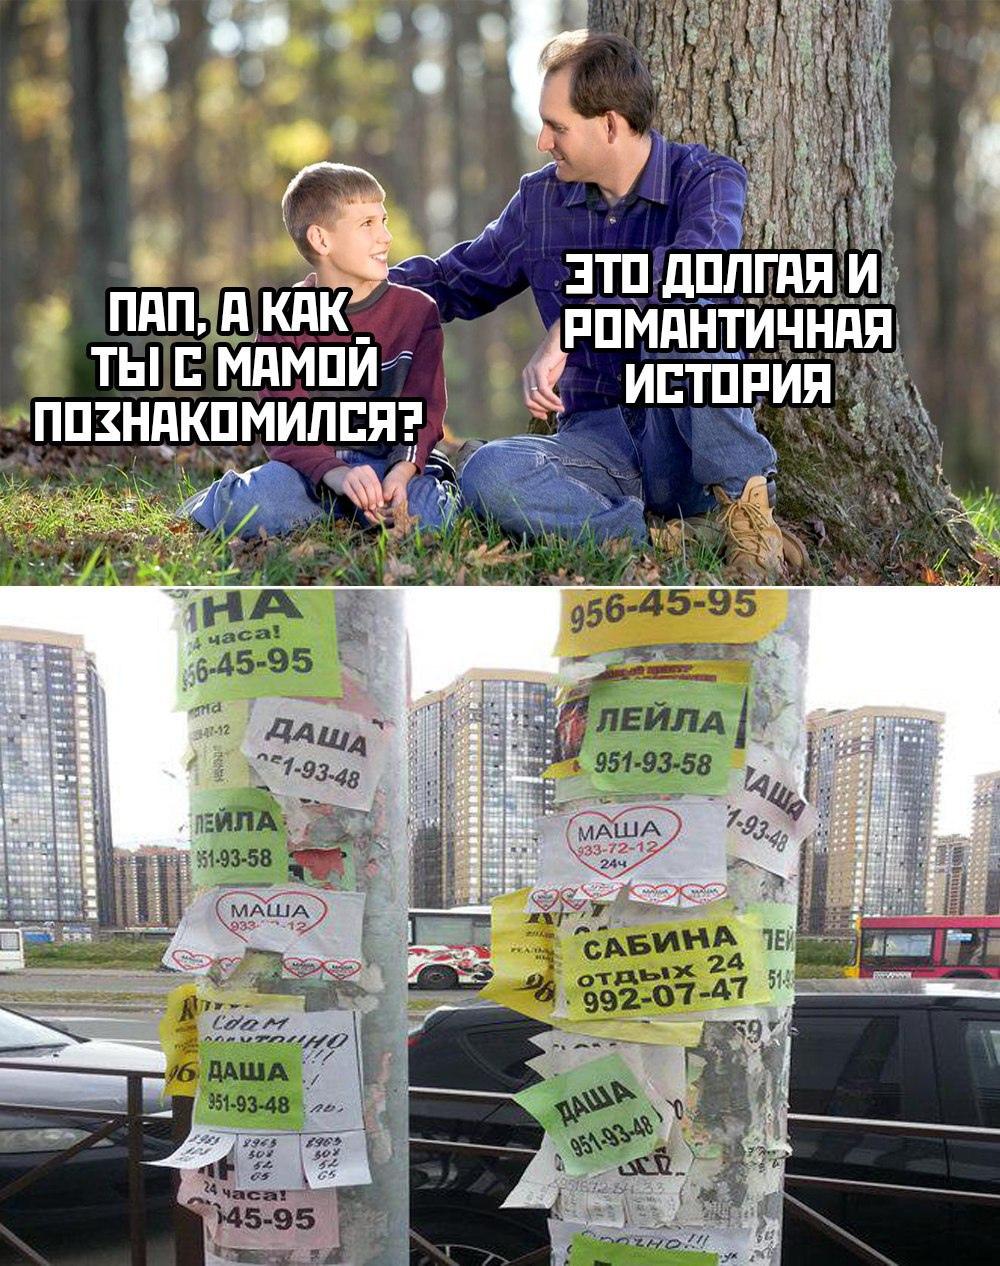 http://s00.yaplakal.com/pics/pics_original/4/5/9/13089954.jpg